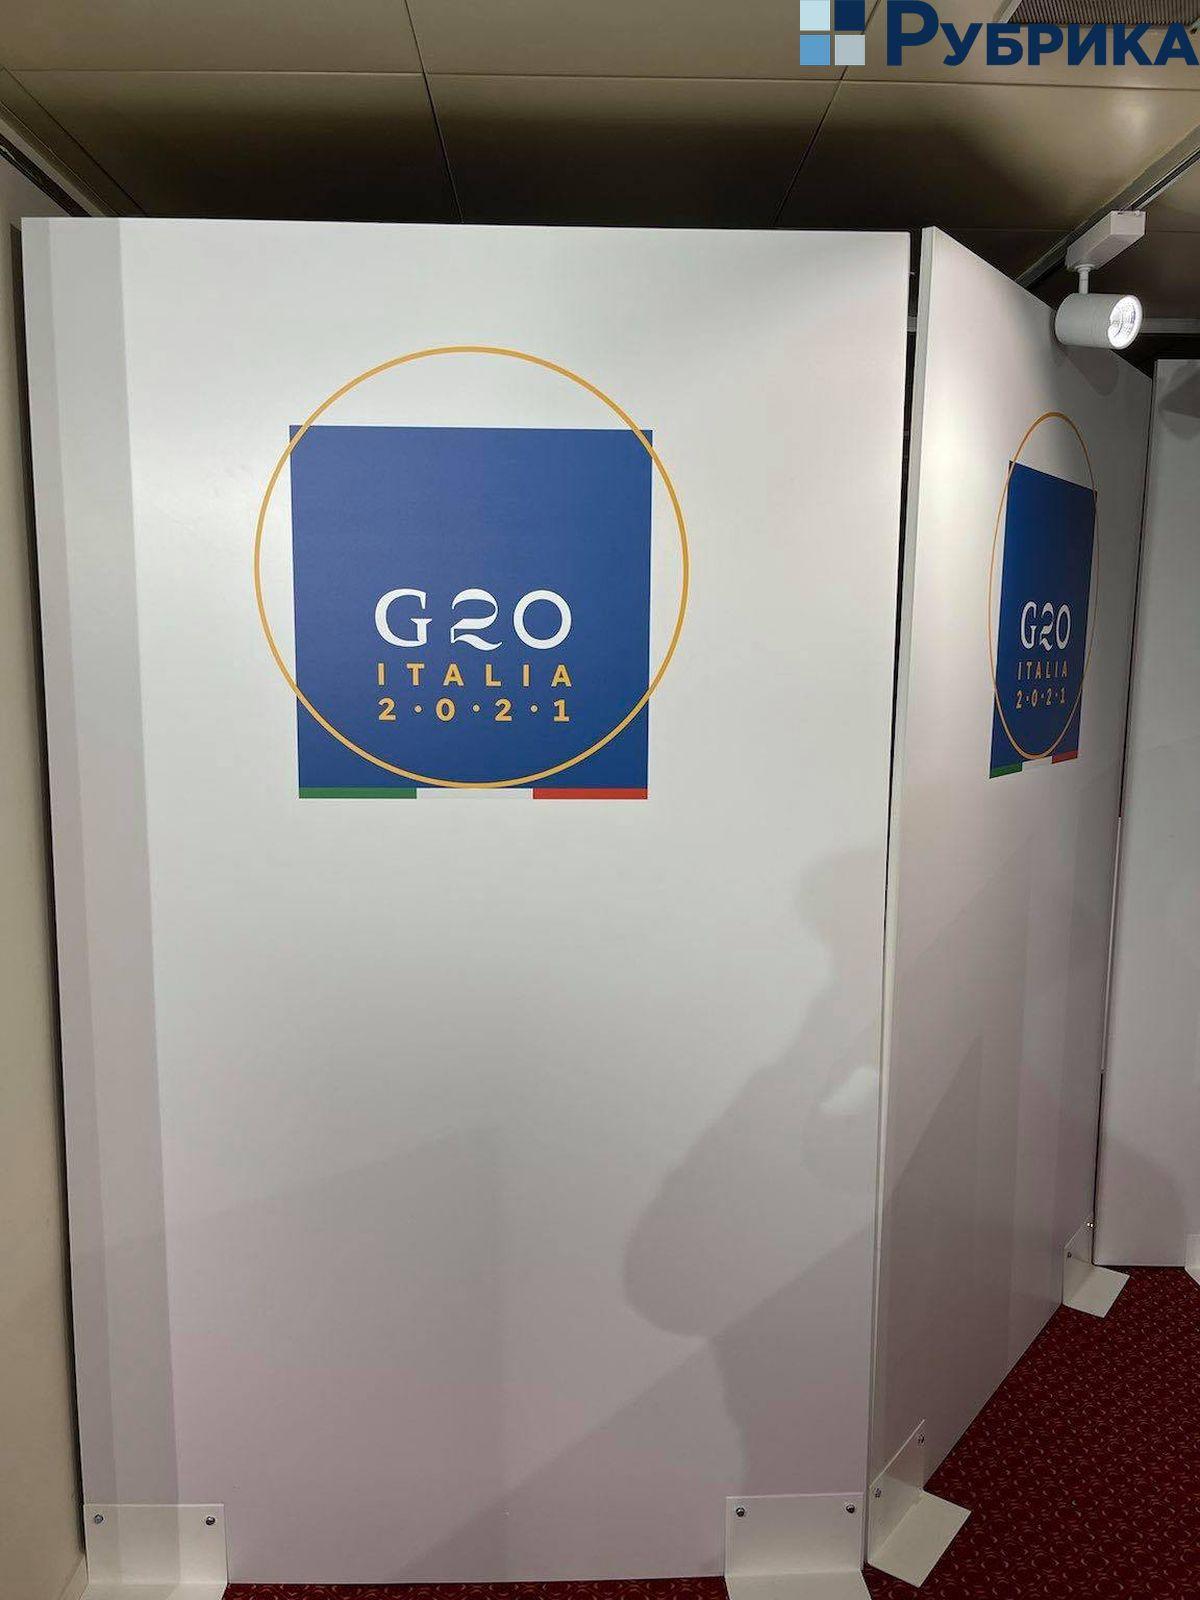 G20 рубрика